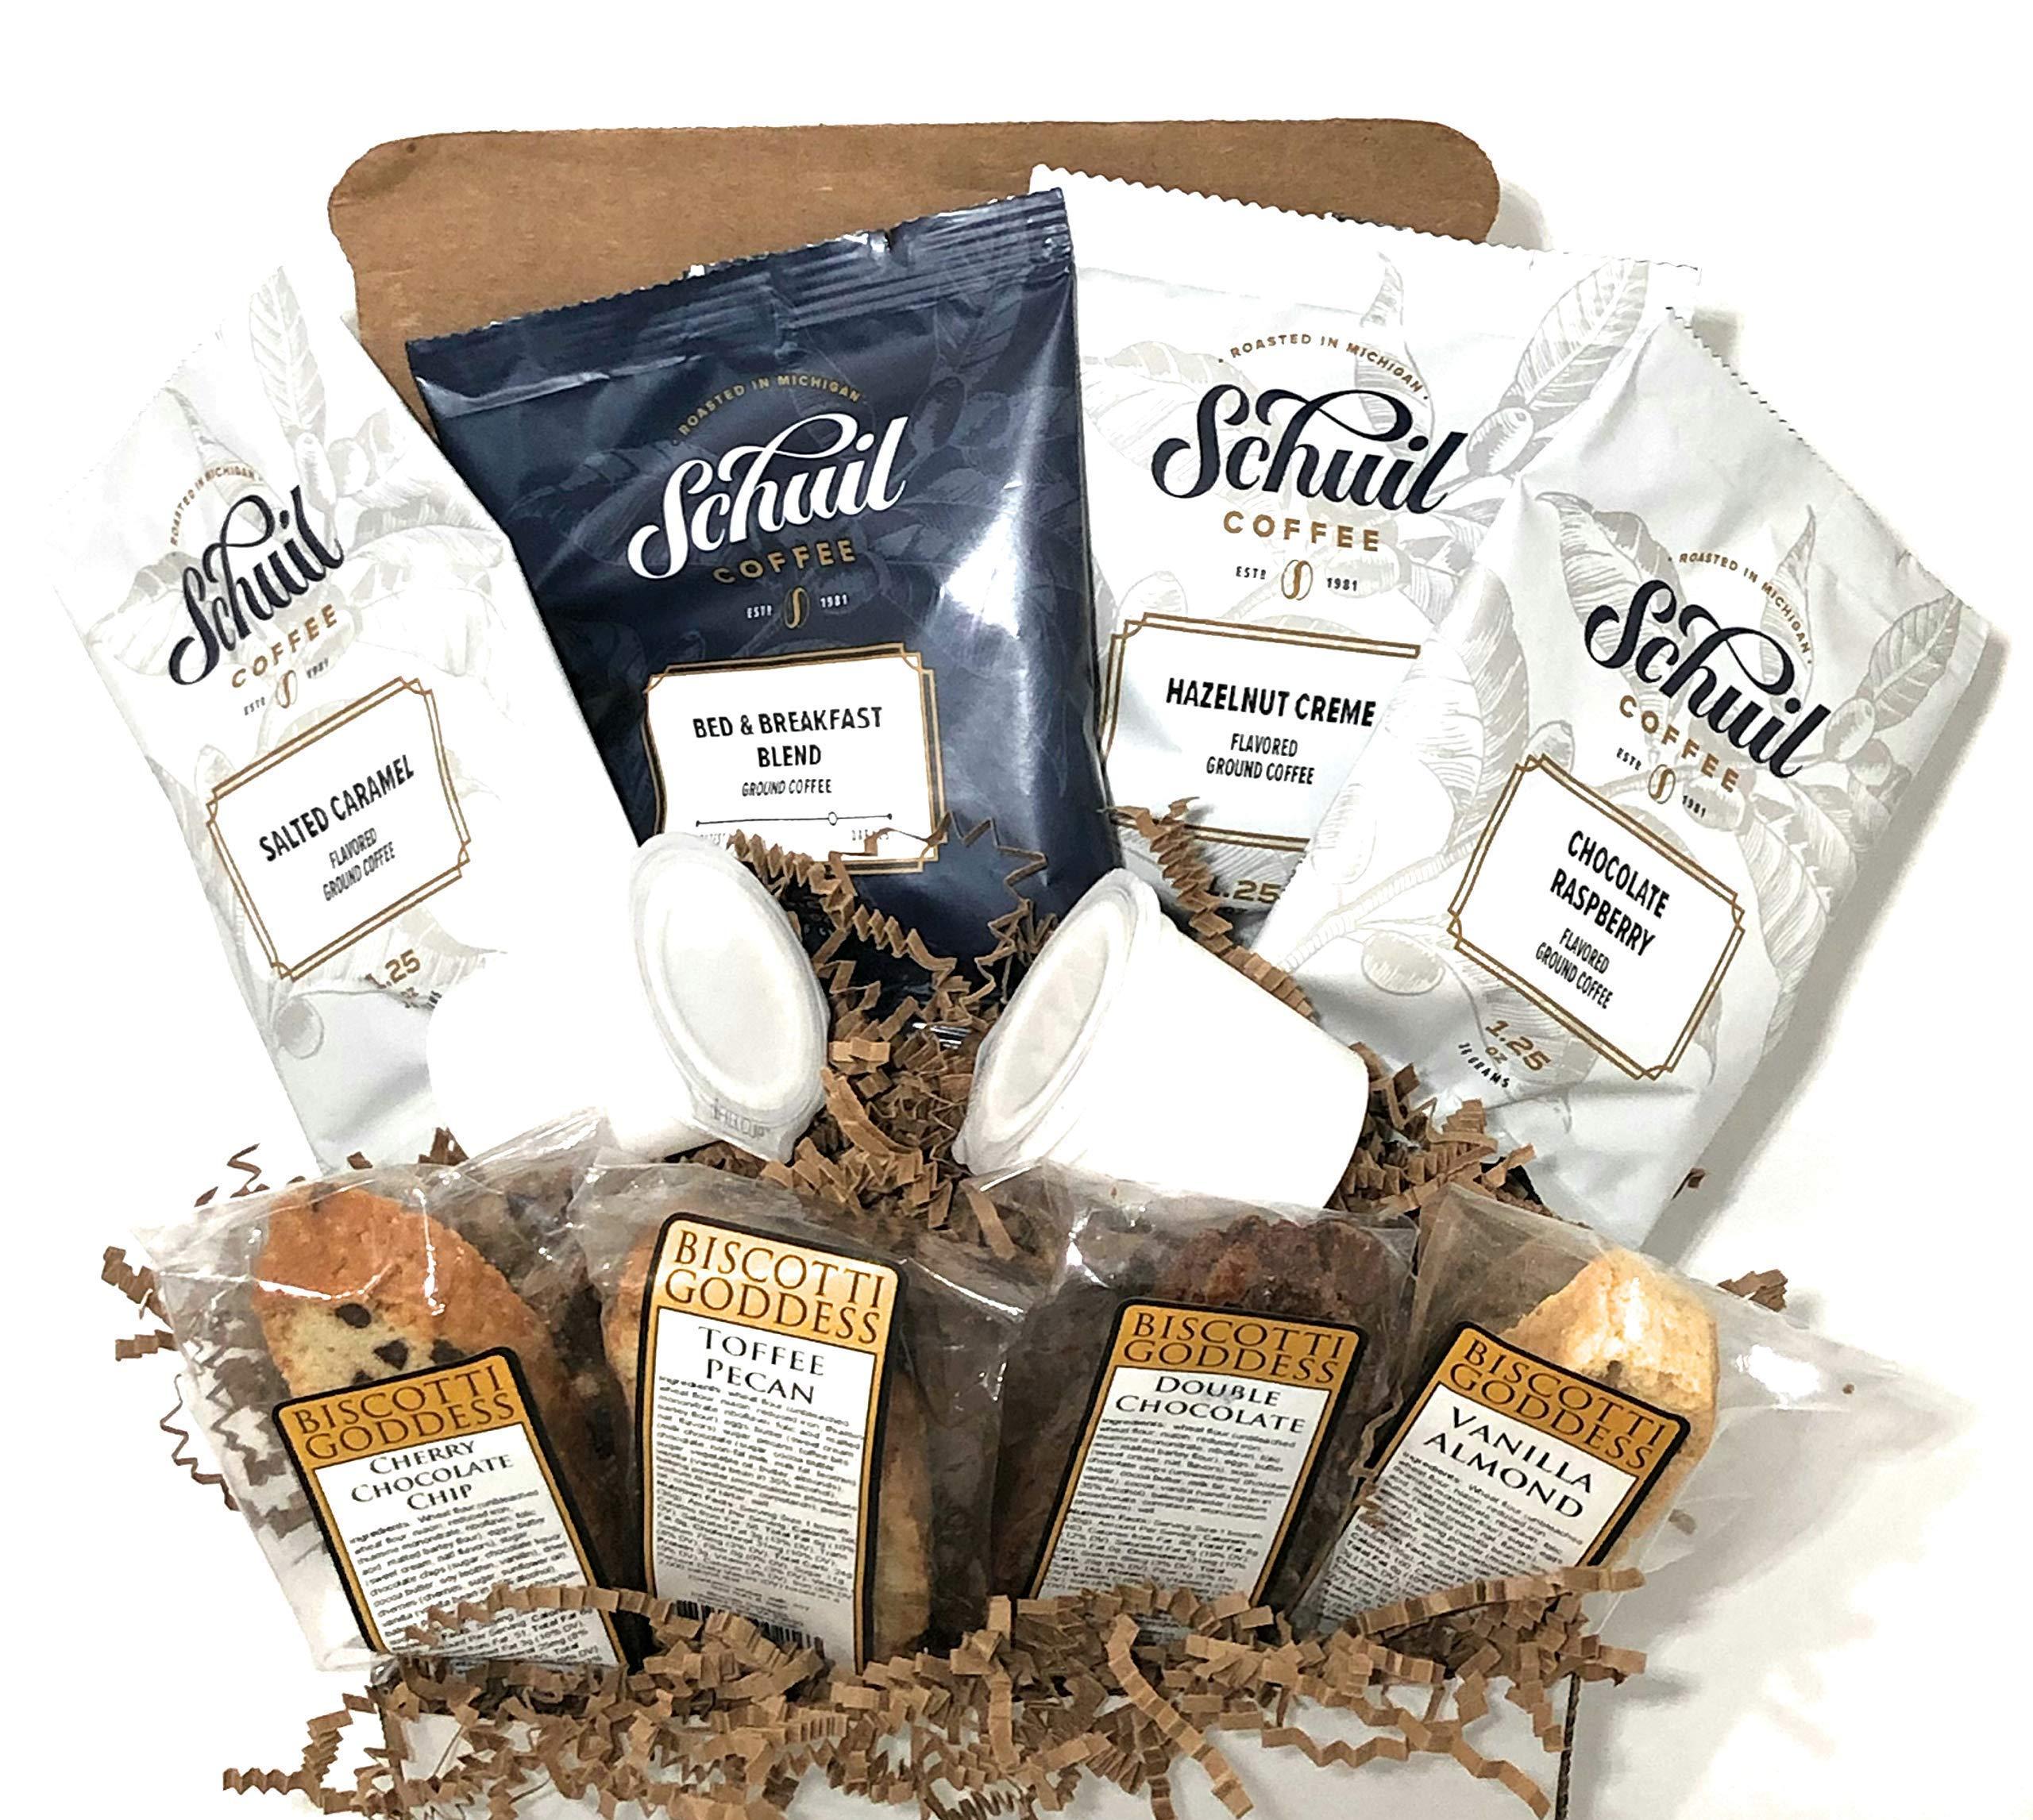 Coffee Gift Box Set With Kosher Non-GMO Biscotti & Ifill Cup